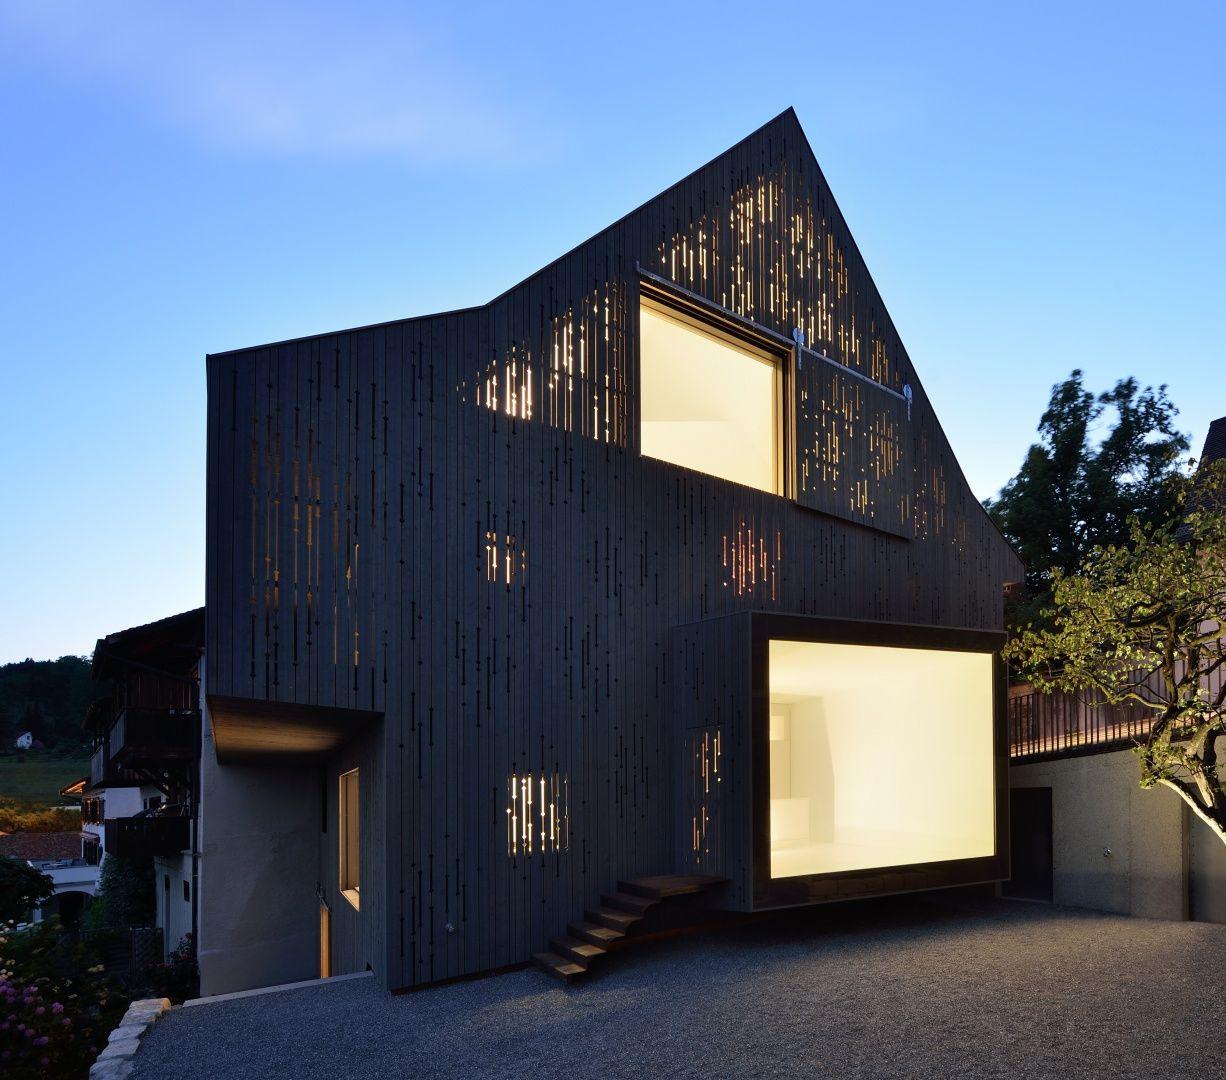 Umbau Haus Lendenmann   Schweizer Baudokumentation   Thema ...